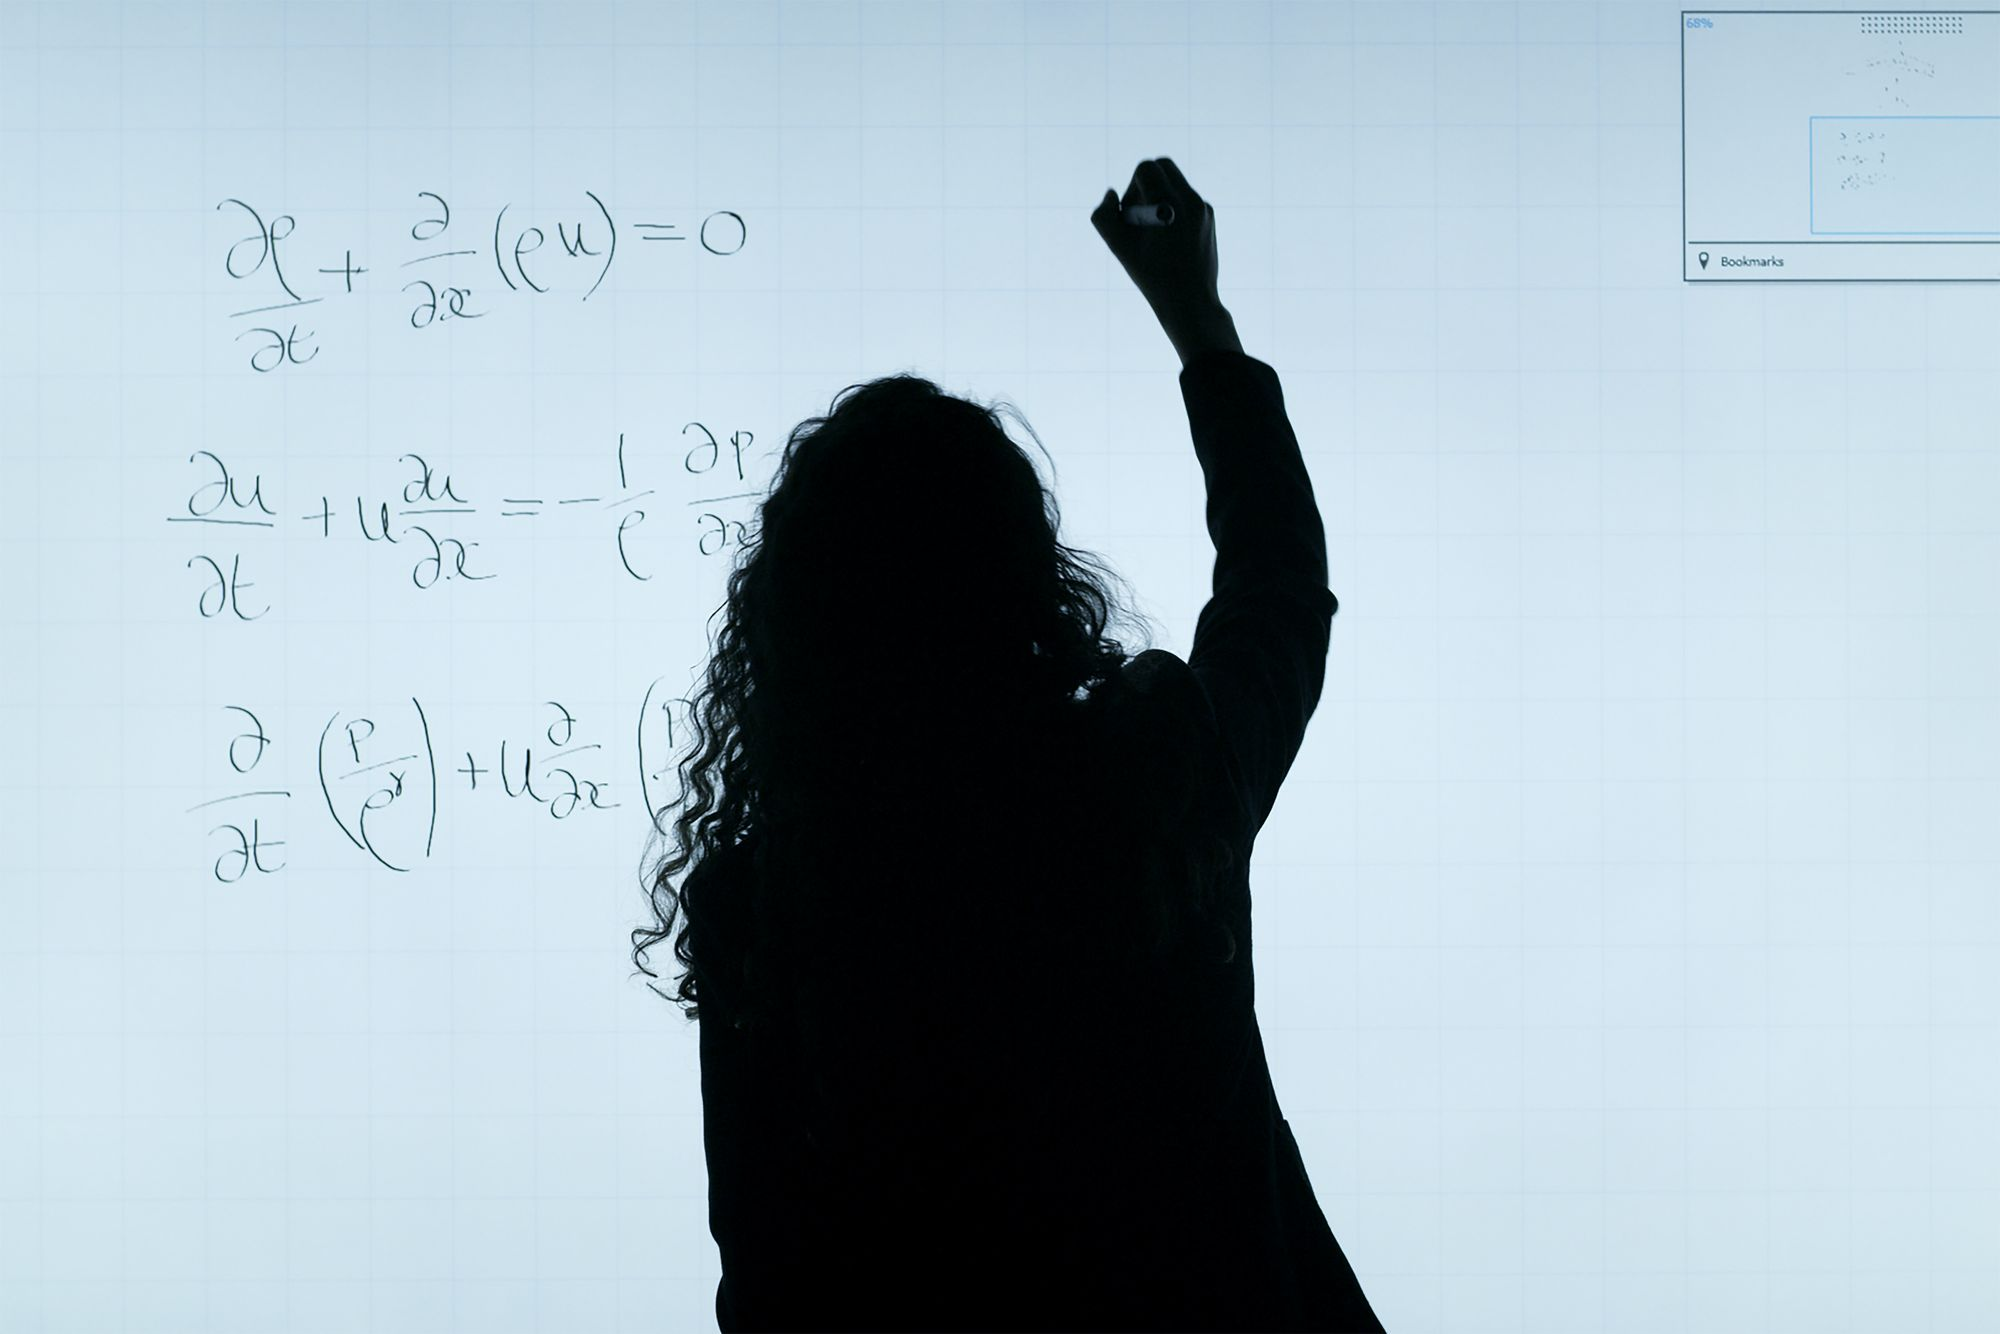 Poisson Distribution – A Formula to Calculate Probability Distribution